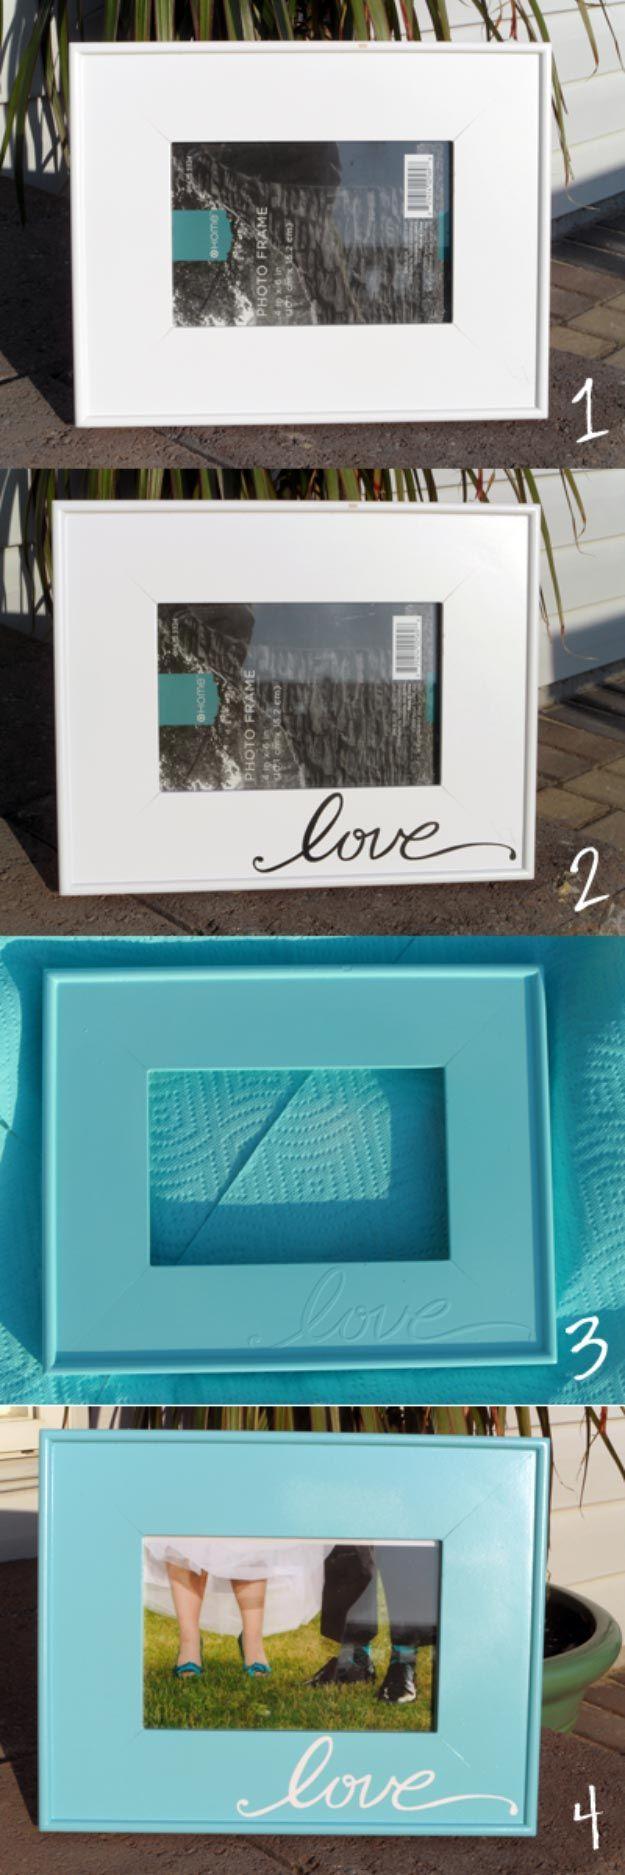 Cricut Craft Ideas And Crafts On Pinterest